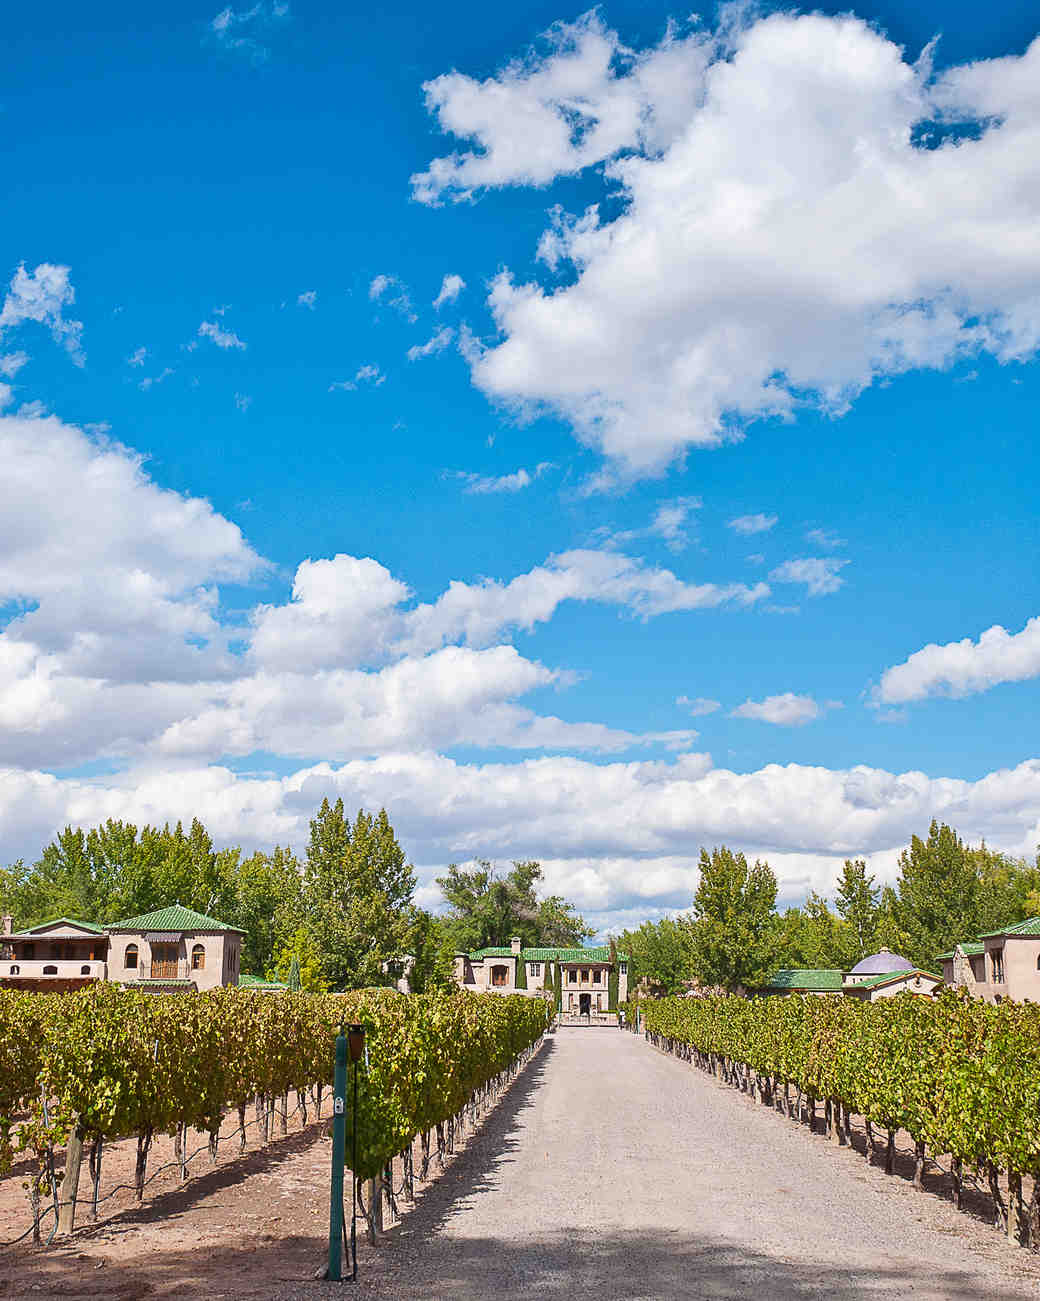 bachelorette-hotel-albuquerque-winery.jpg